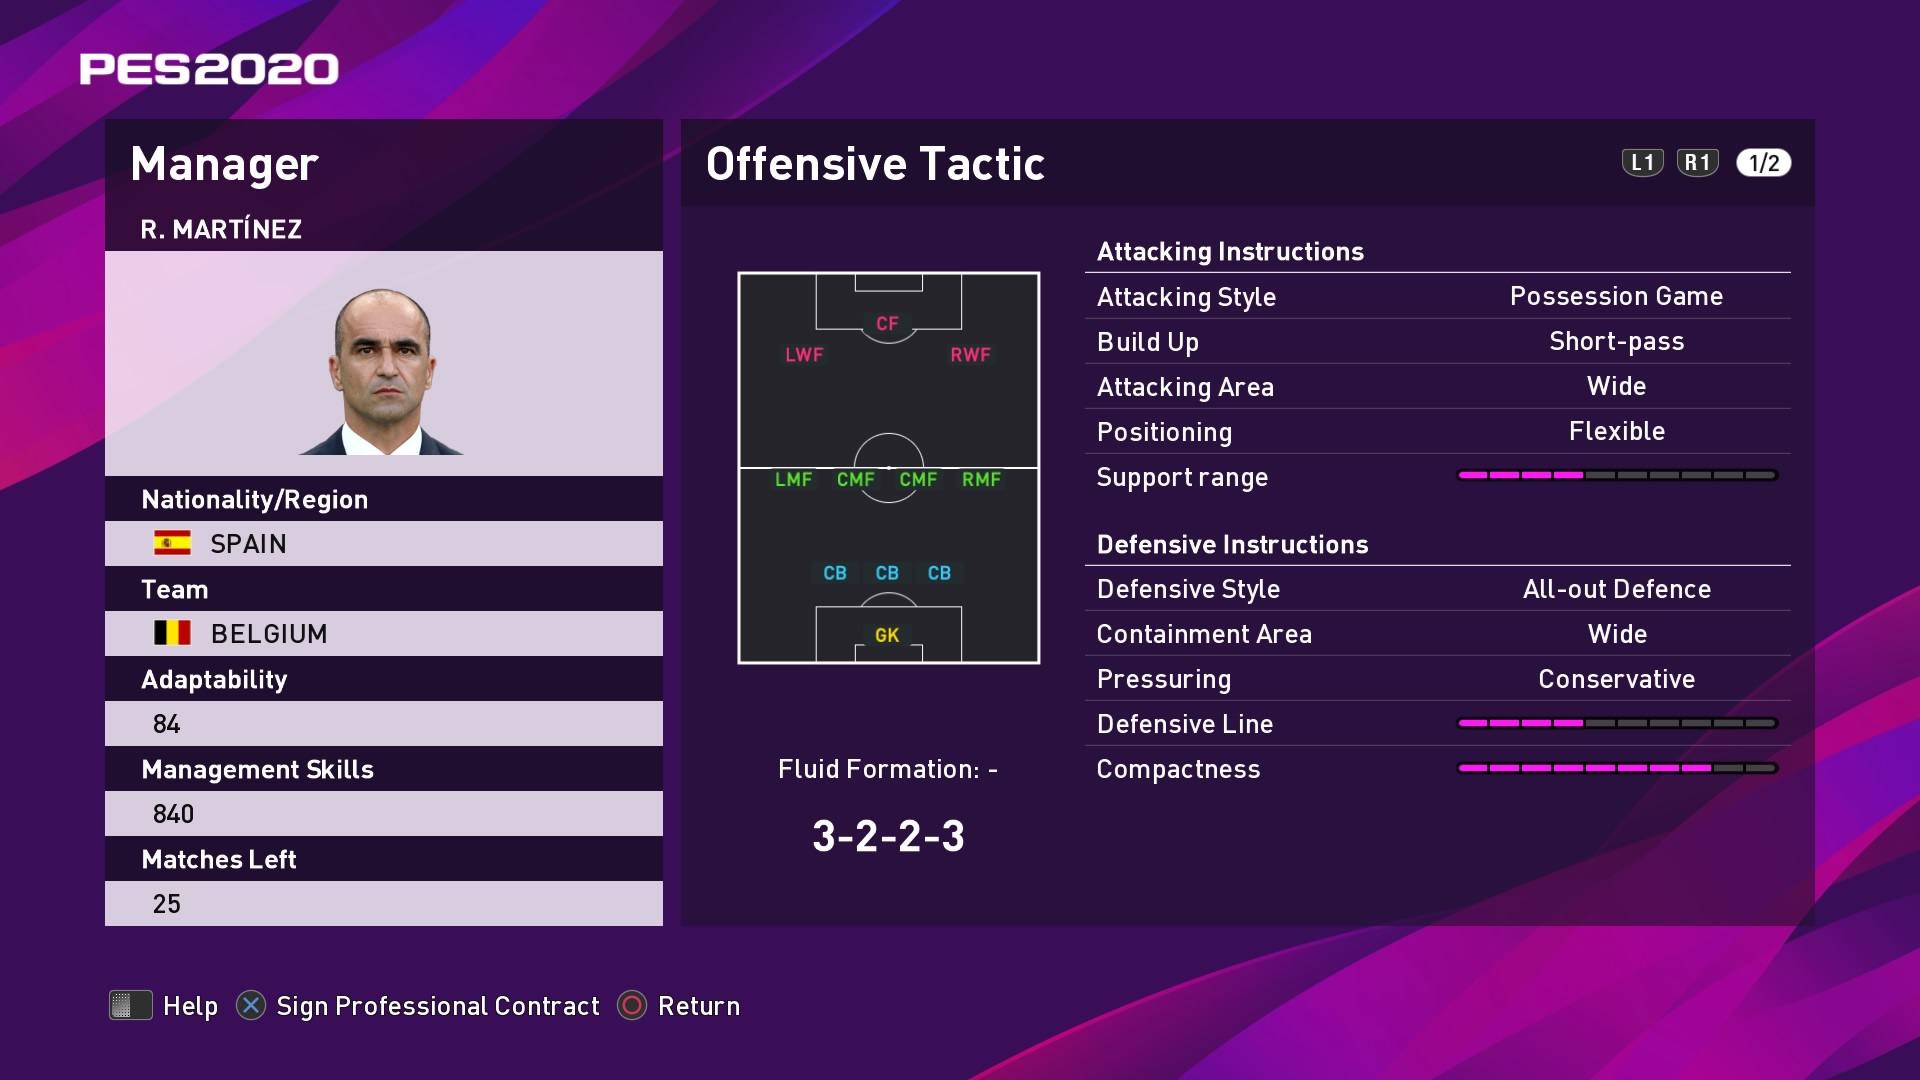 R. Martínez (Roberto Martínez) Offensive Tactic in PES 2020 myClub